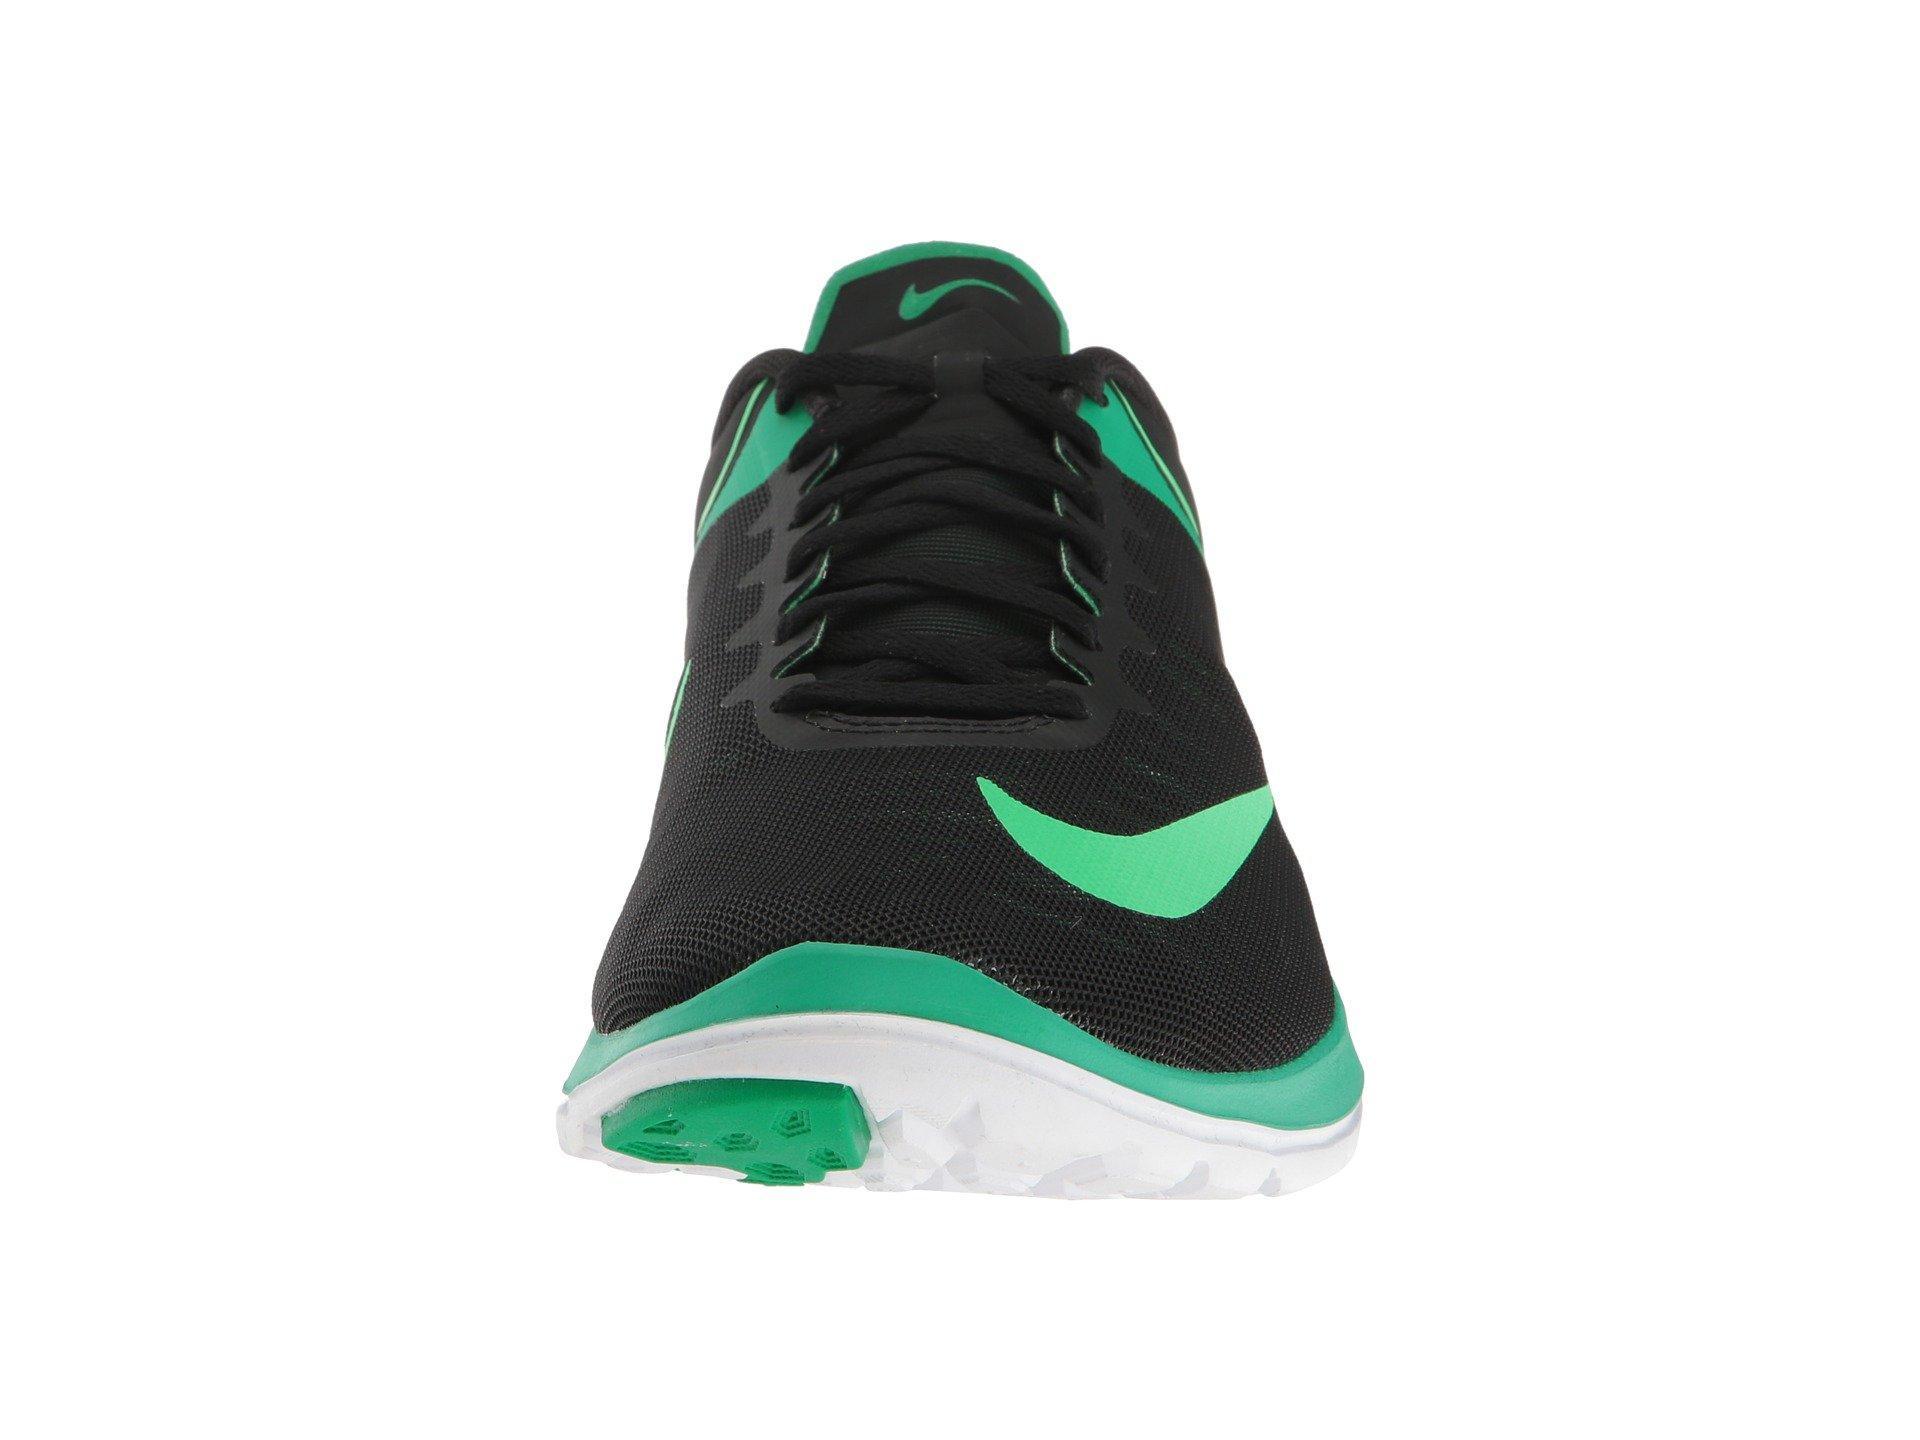 3975c84b578 Lyst - Nike Fs Lite Run 4 in Green for Men